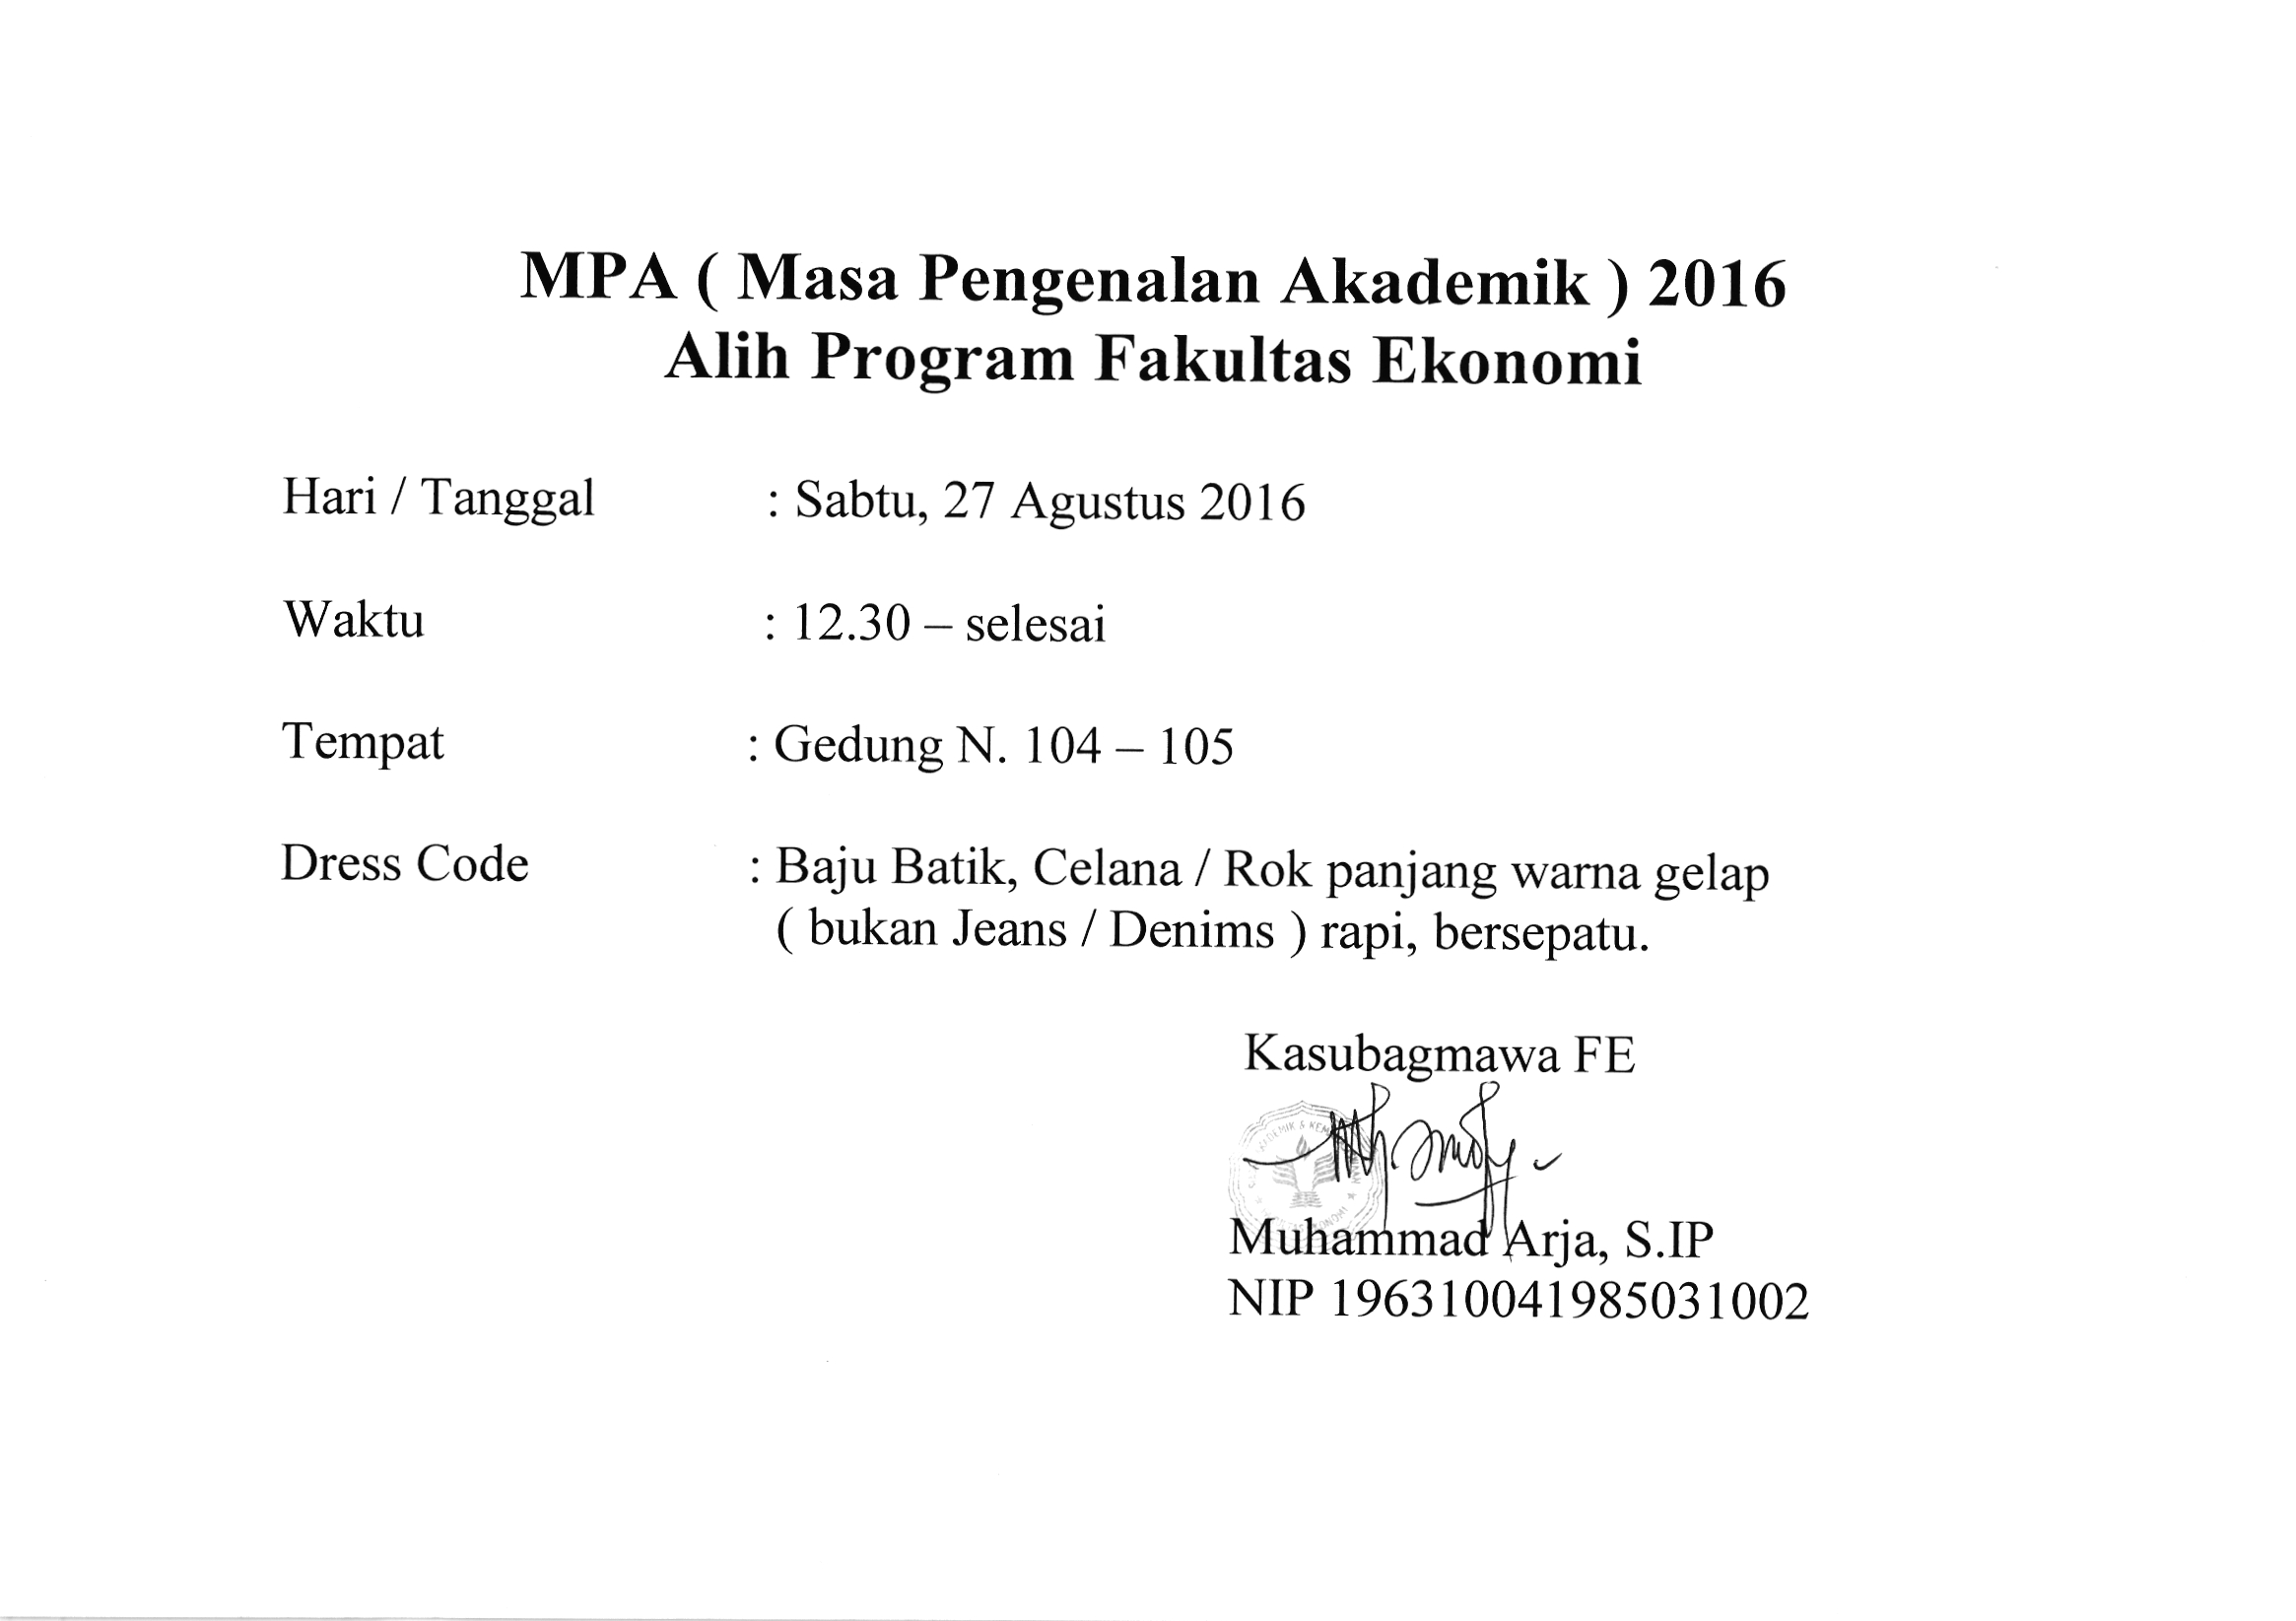 MPA-Alih-Program